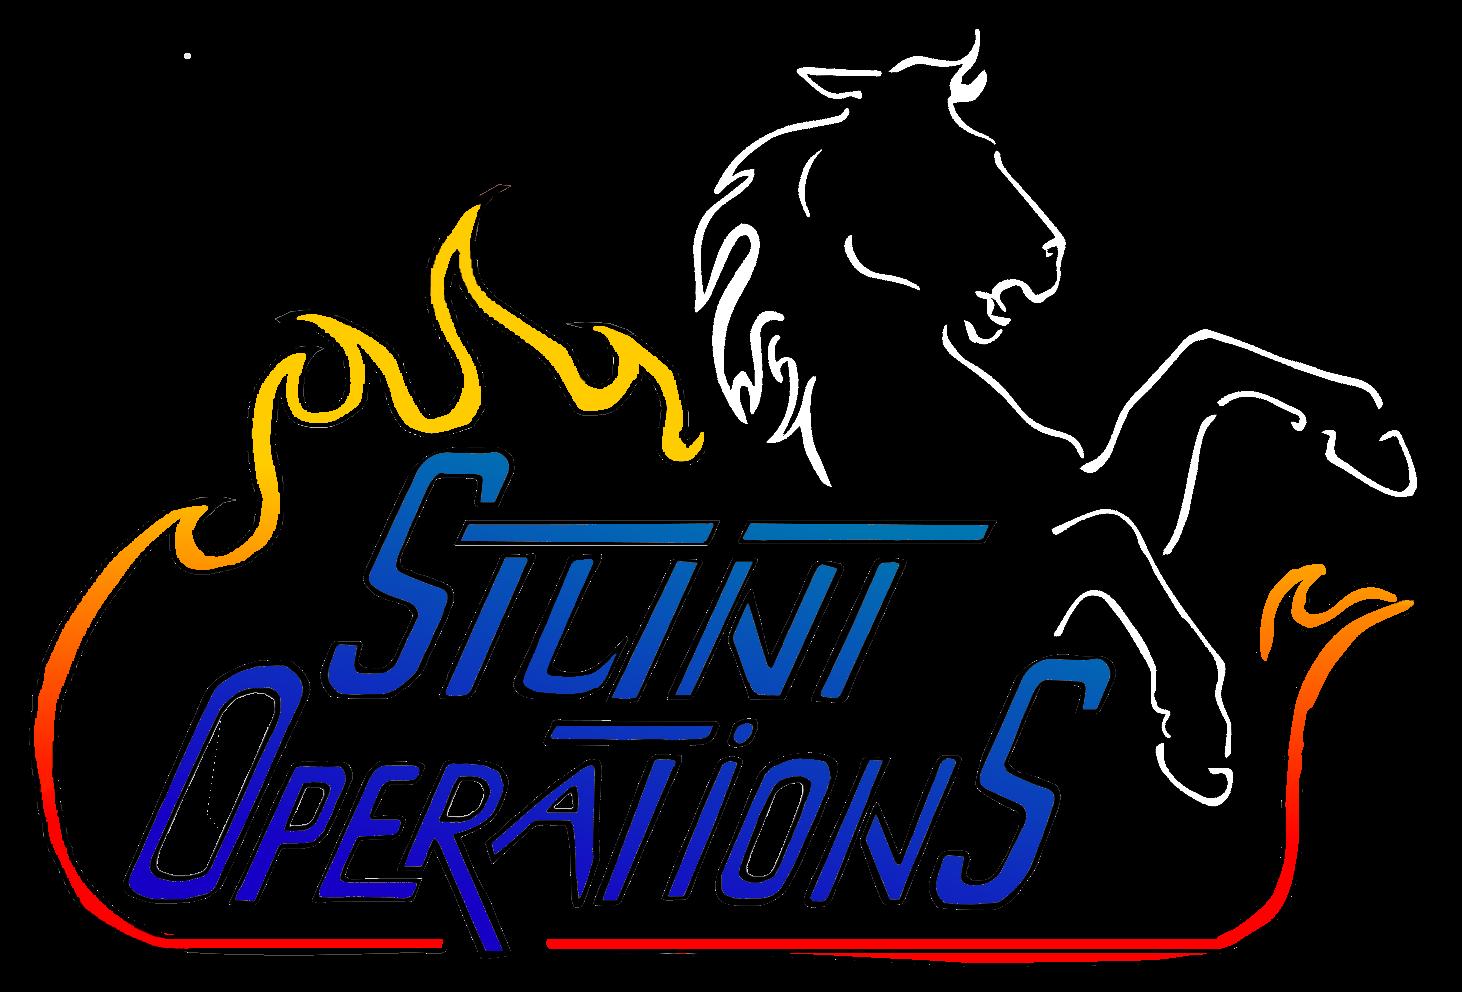 Stunt Operations